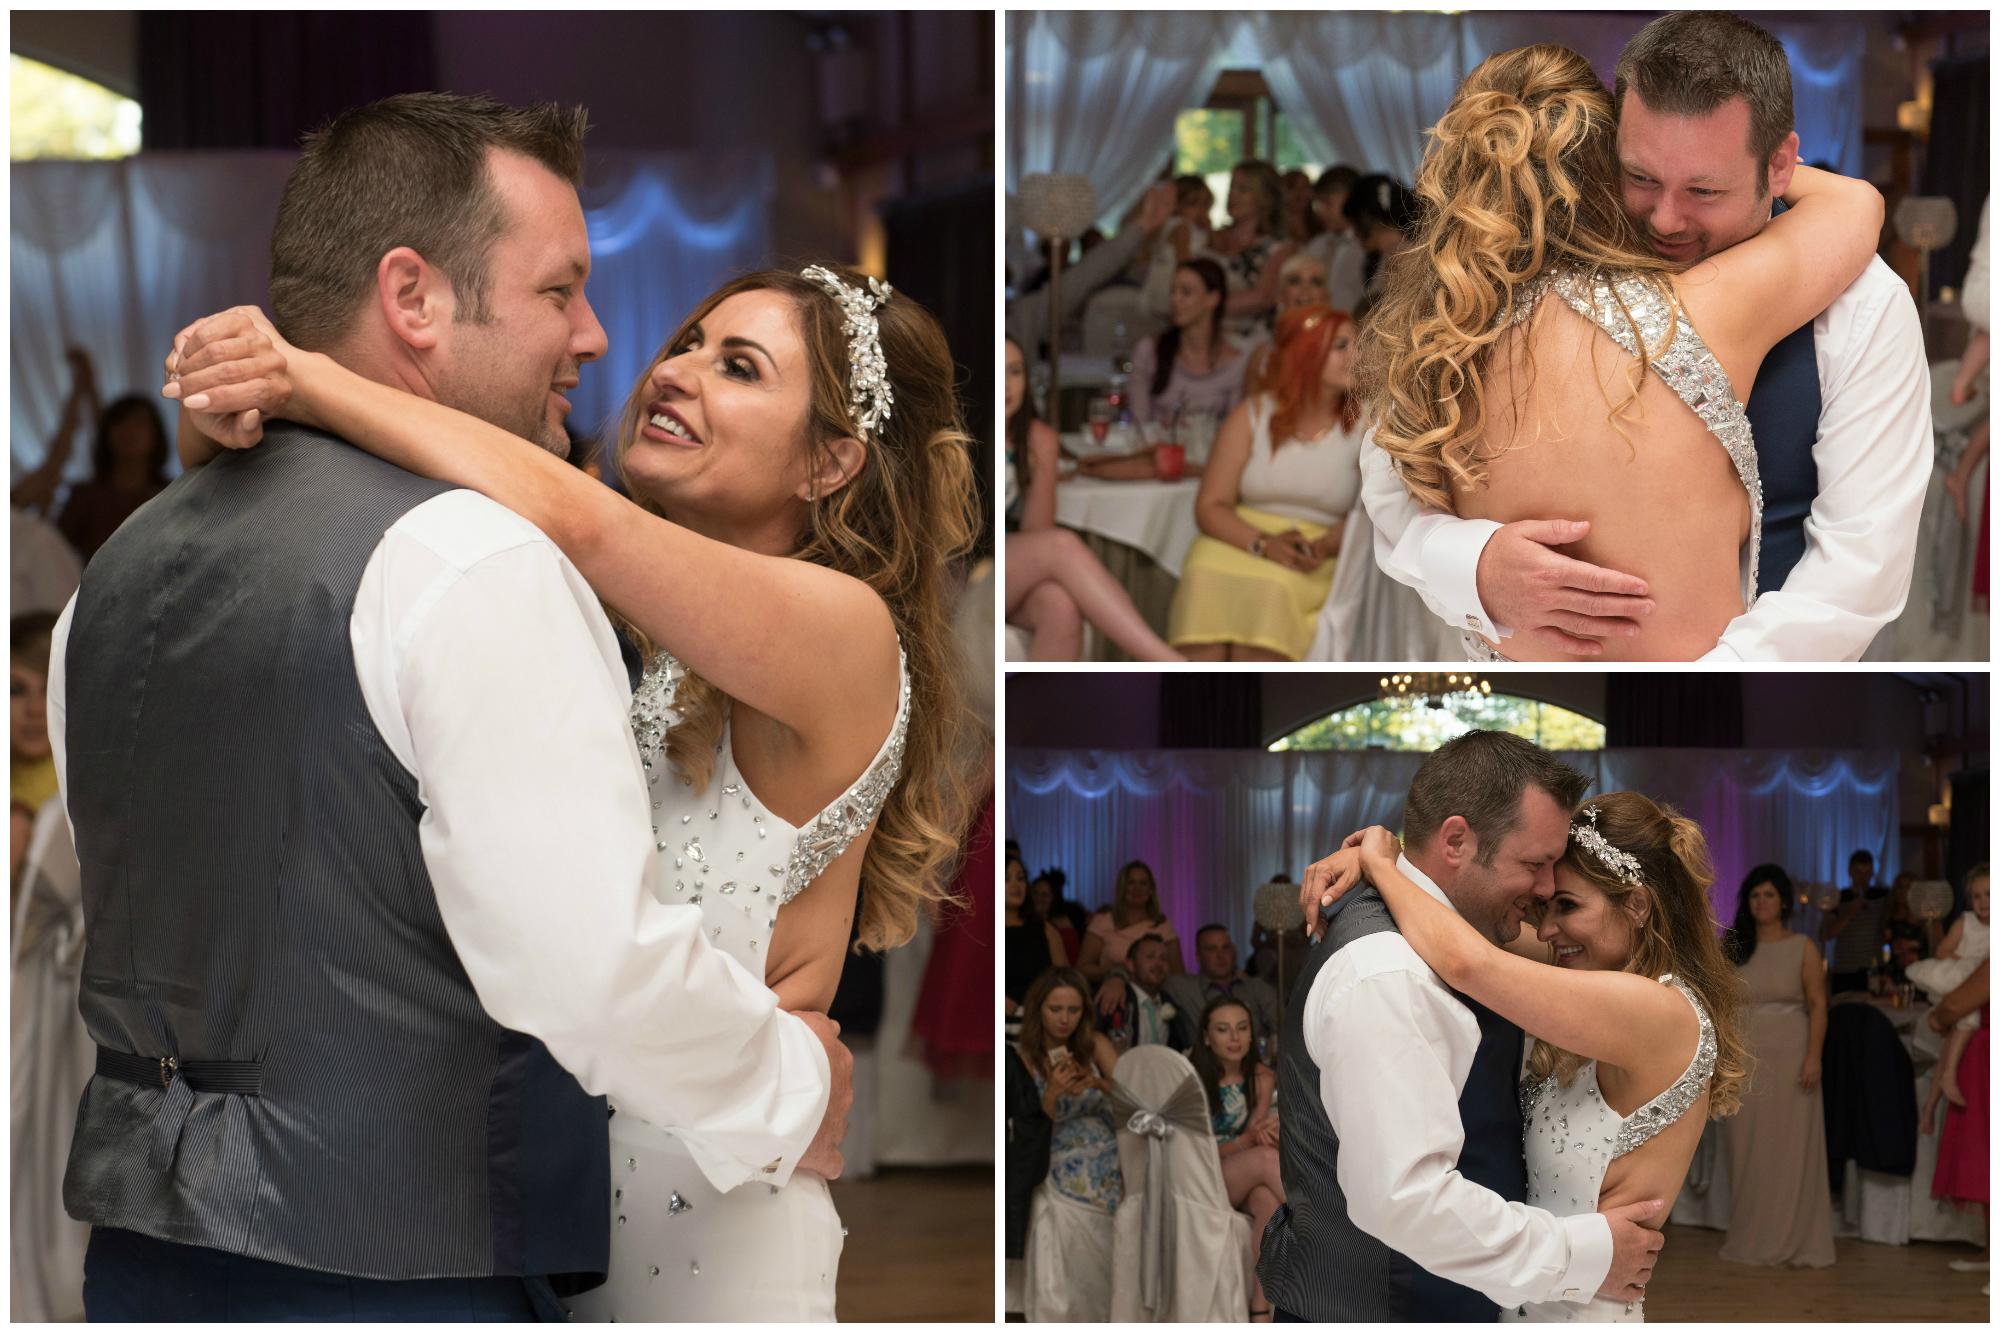 Lusty Beg Island Northern Ireland Wedding Photographers Pure Photo N.I the first dance